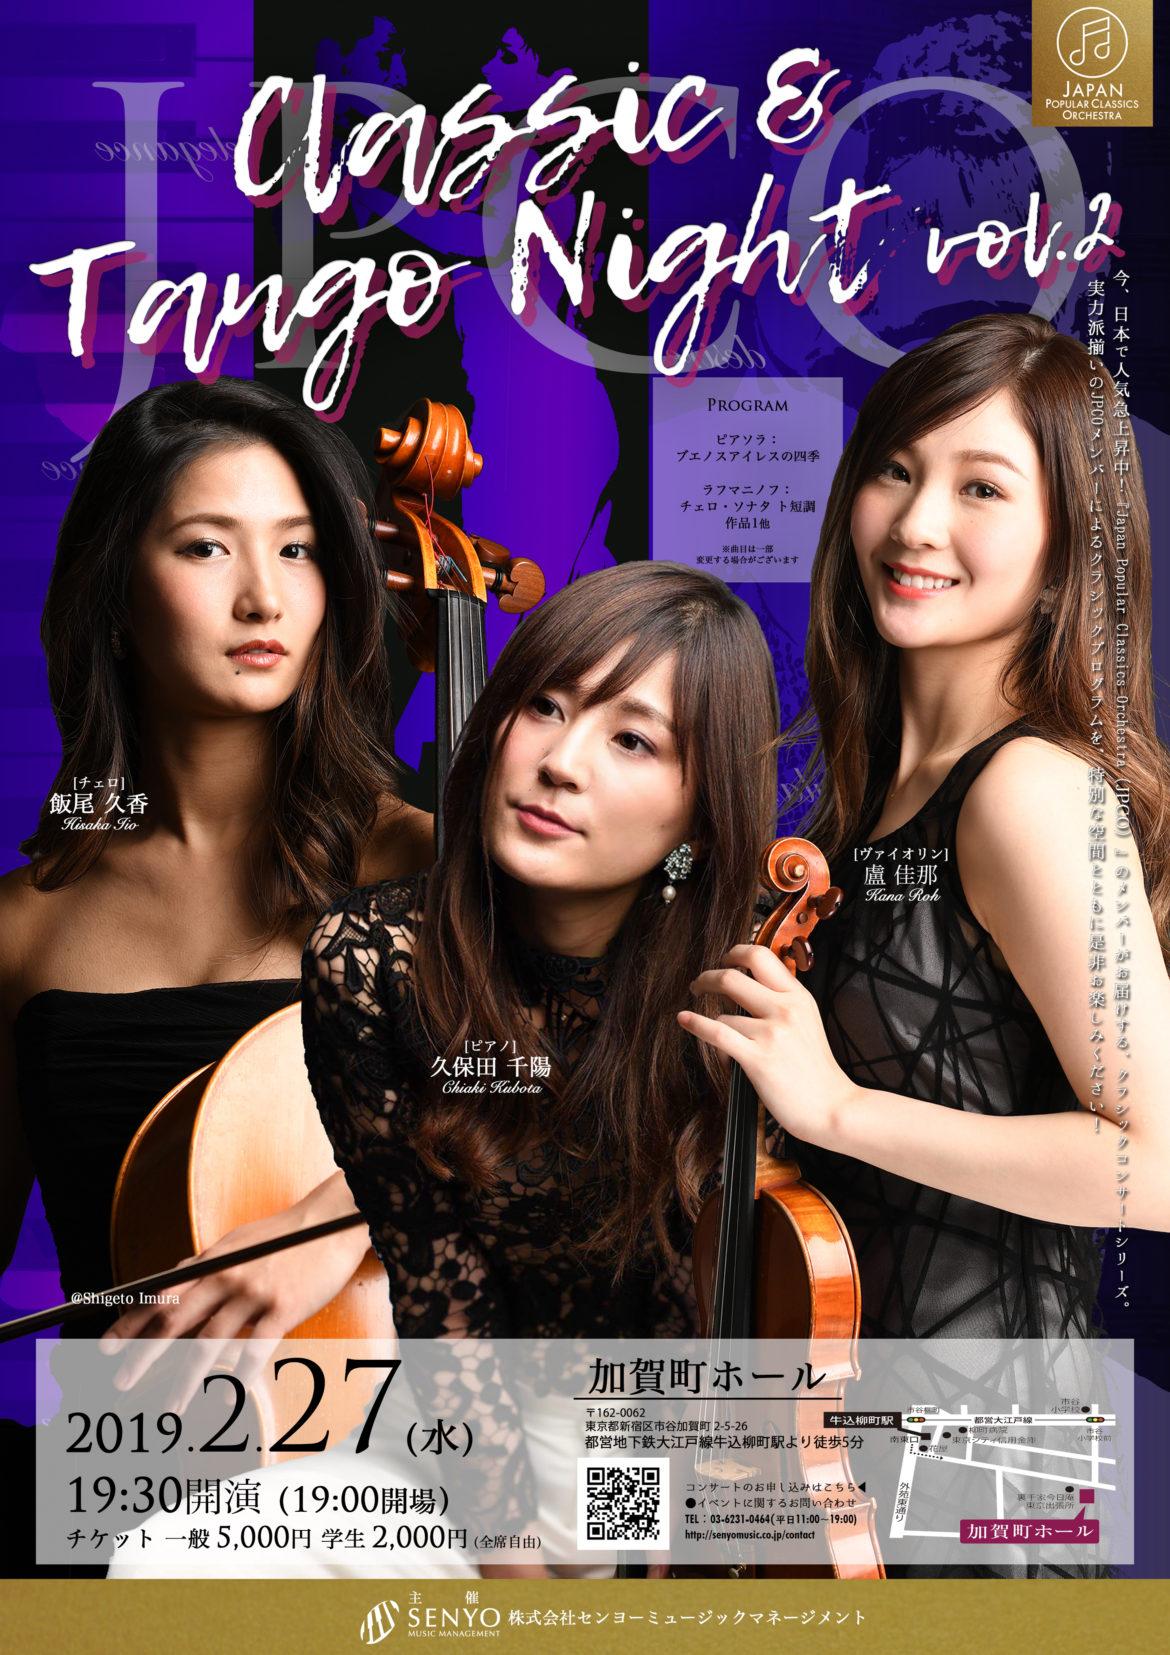 2019.2.27  JPCO CLASSIC & TANGO NIGHT  vol.2